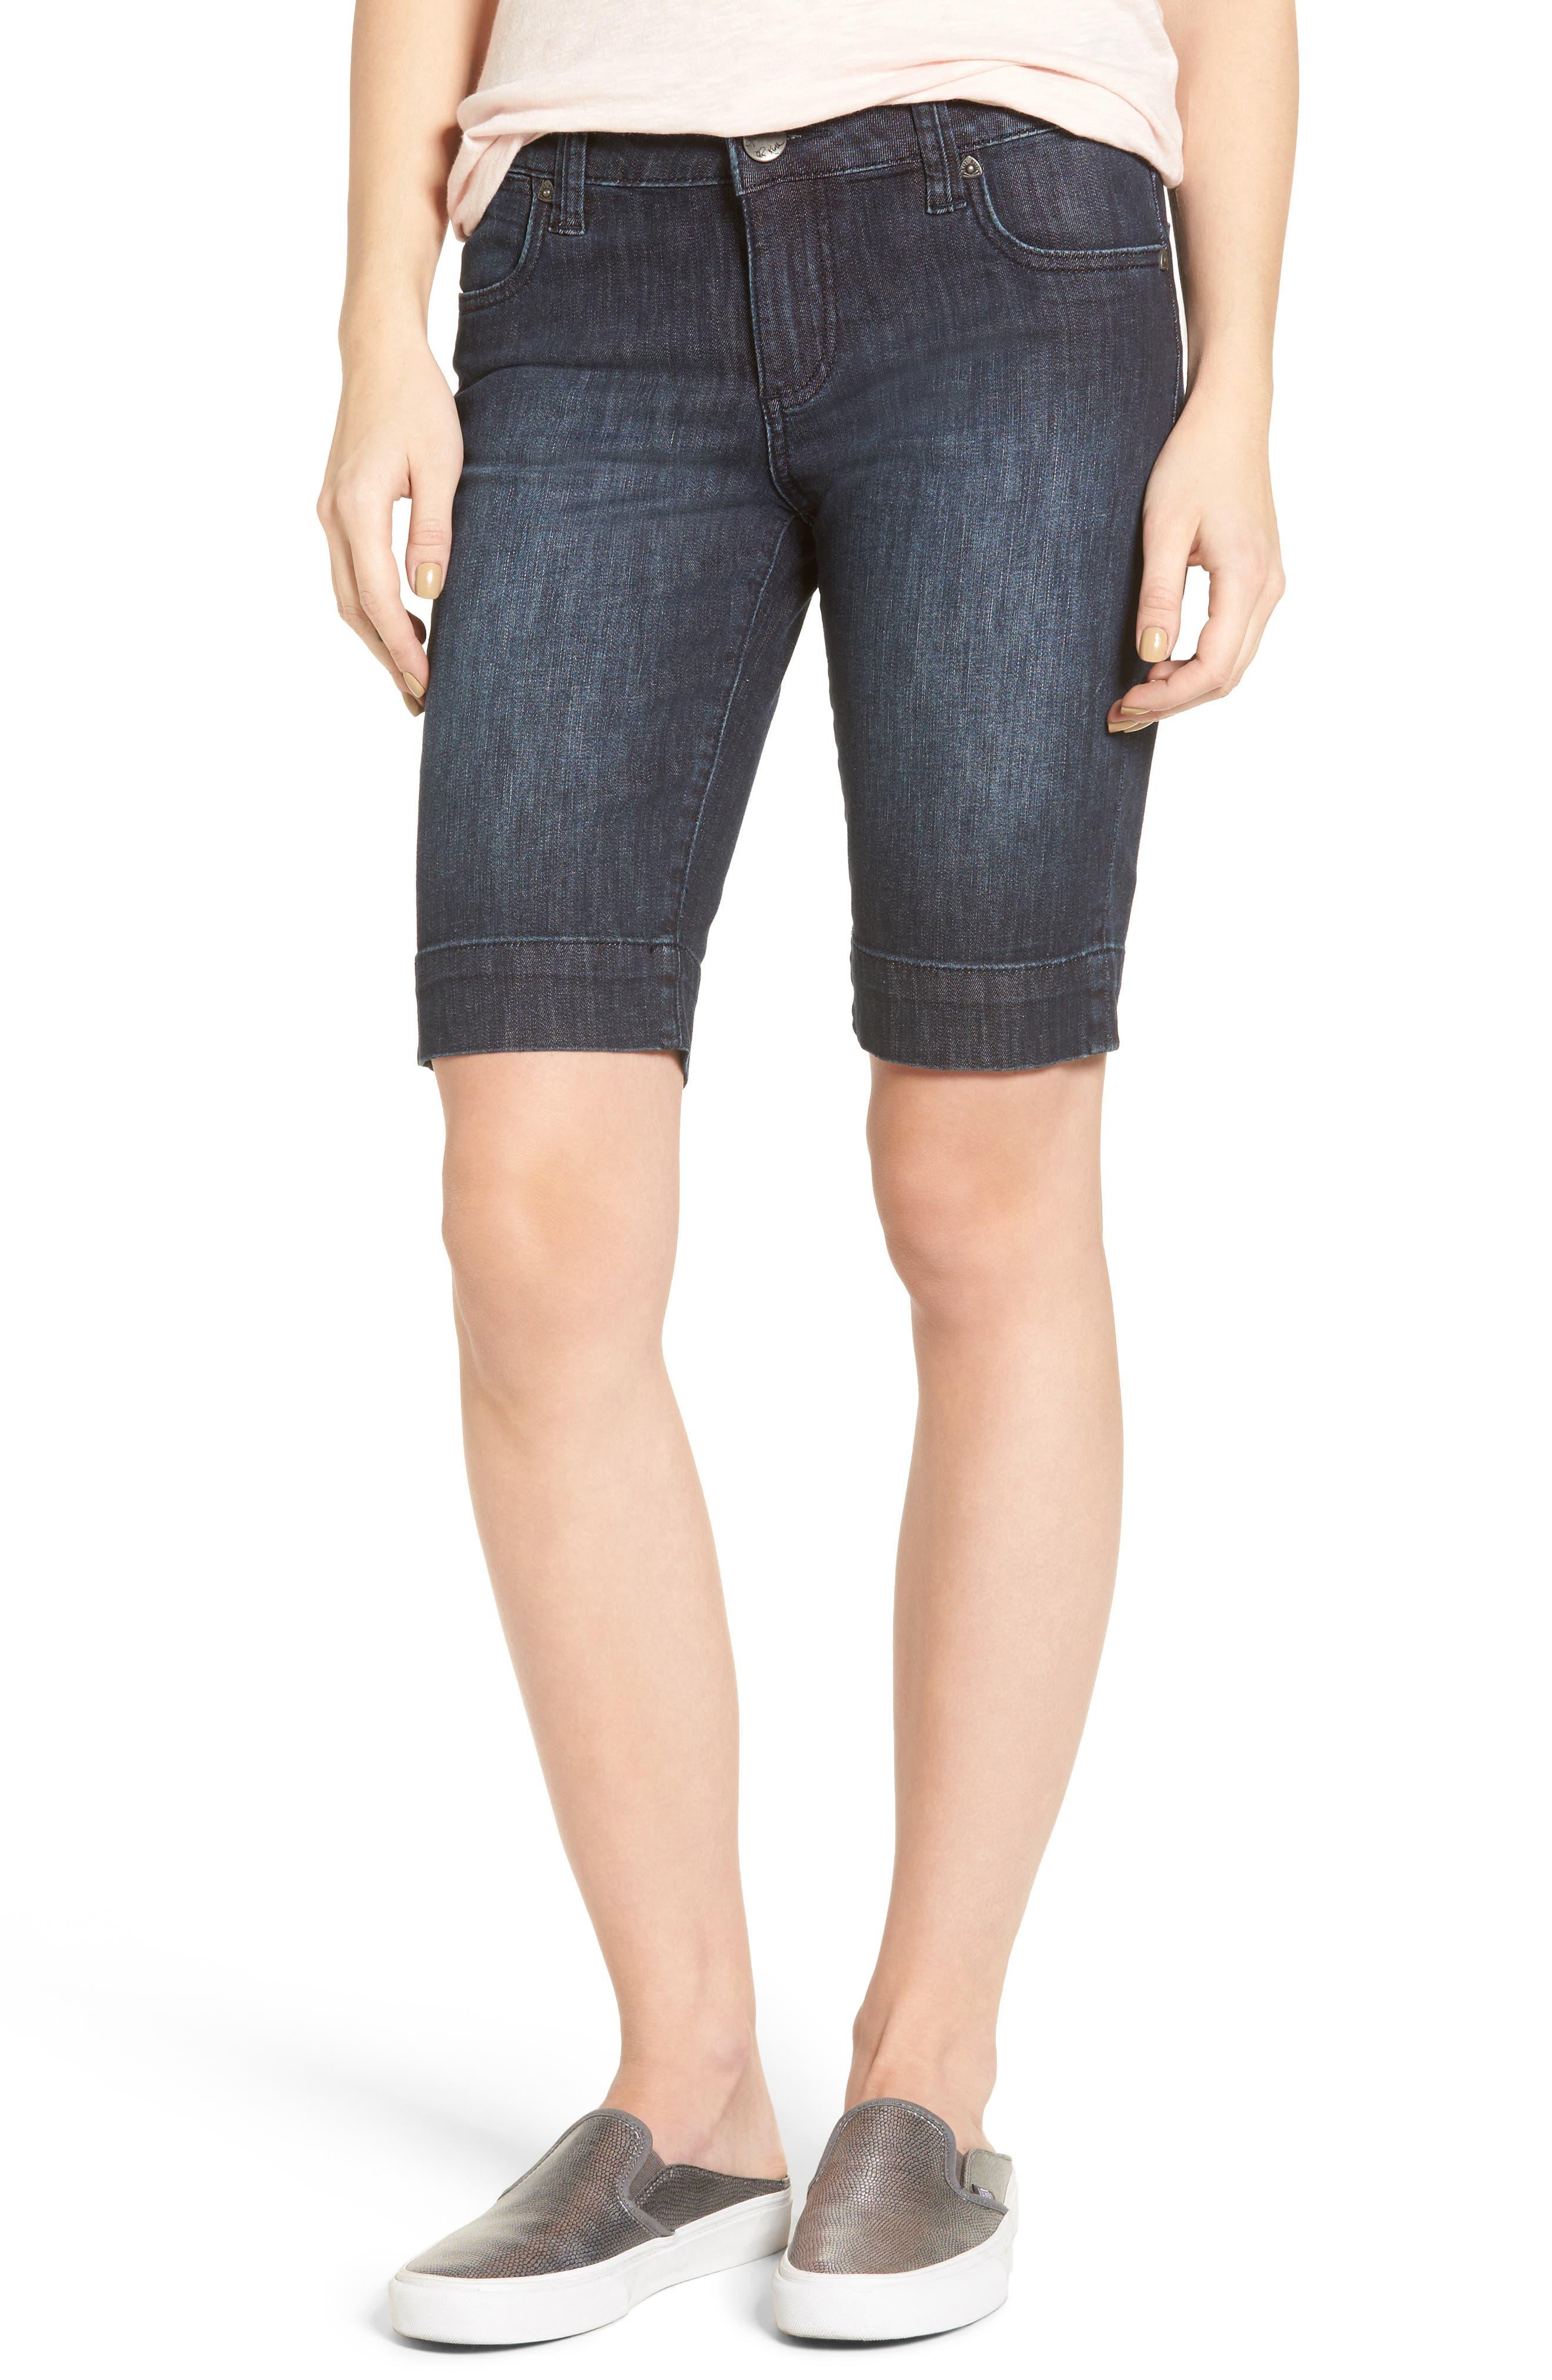 KUT from the Kloth 'Natalie' Twill Bermuda Shorts